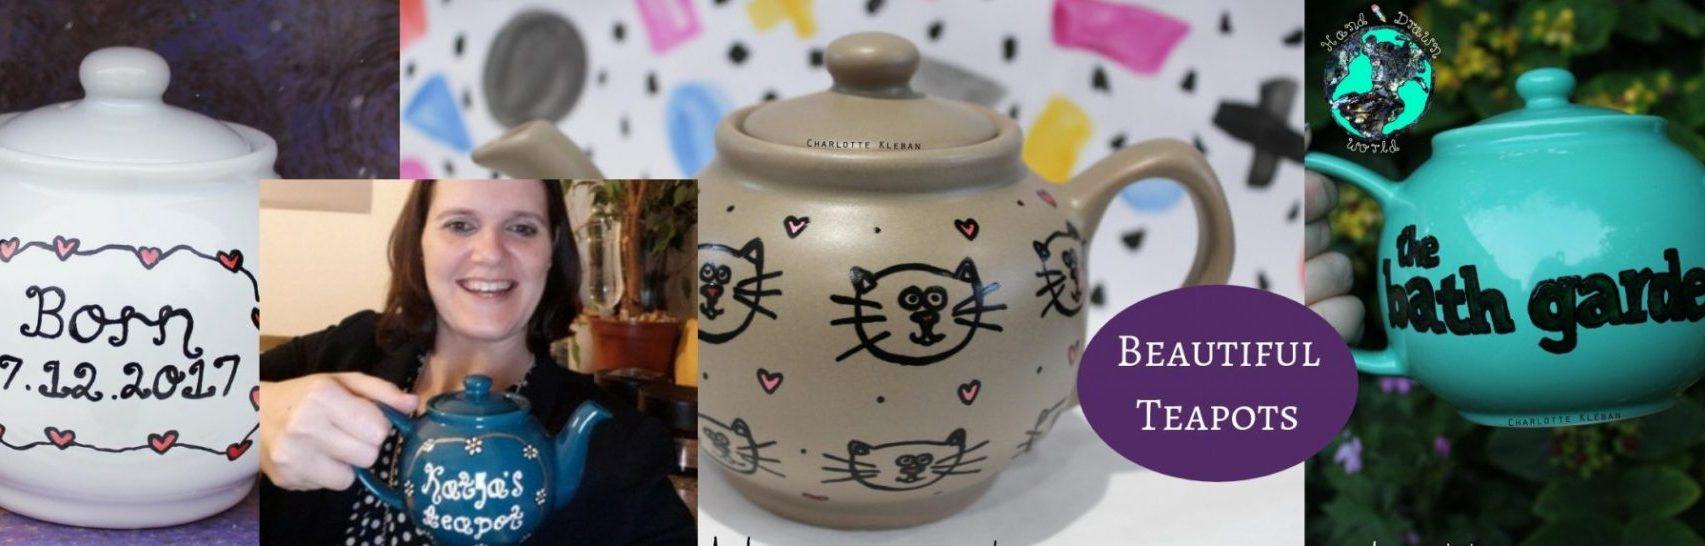 Hand Drawn World By Charlotte Kleban teapots - great gift ideas